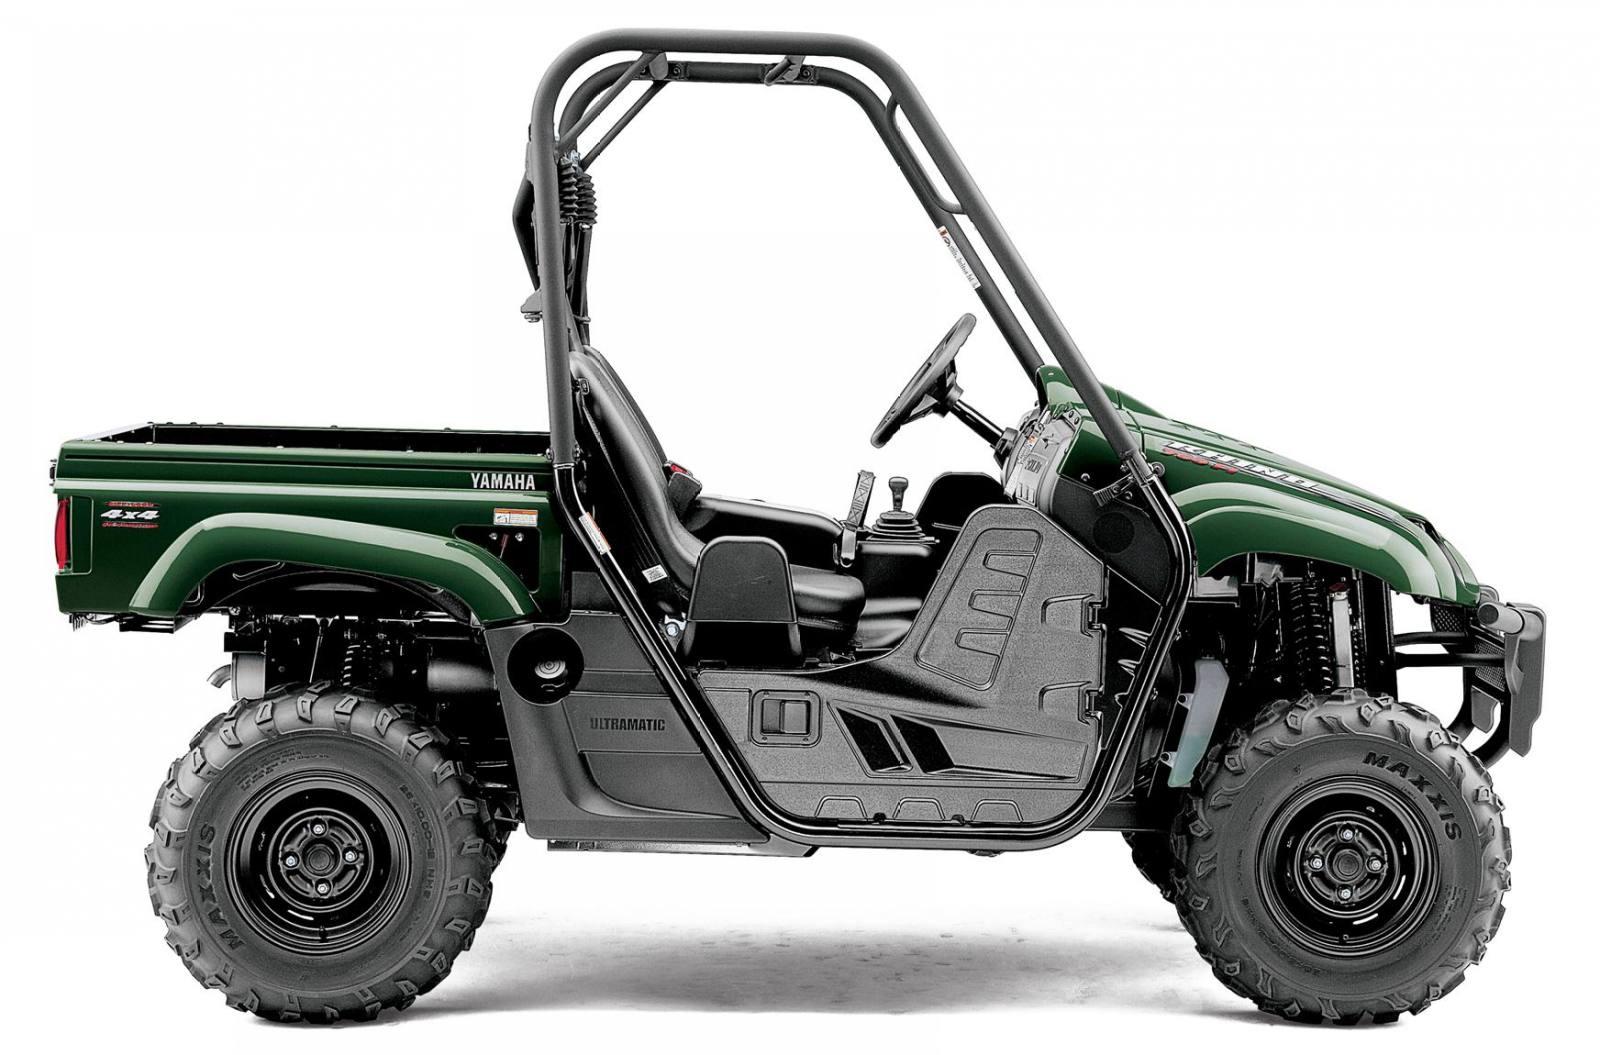 2013 Yamaha Rhino 700 Fi Auto 4x4 For Sale In Fairbanks Ak